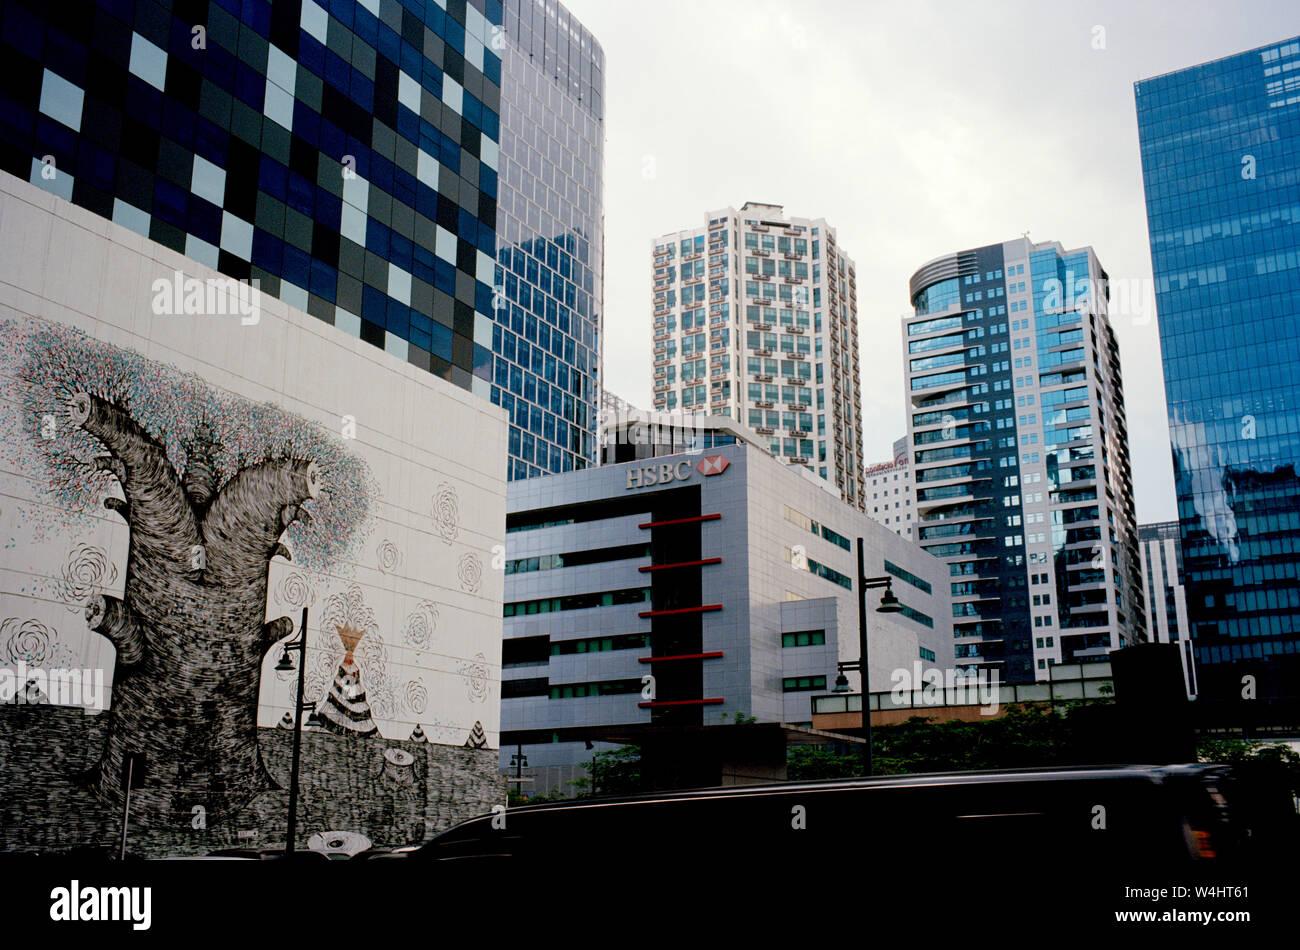 Bonifacio Global City Stock Photos & Bonifacio Global City Stock